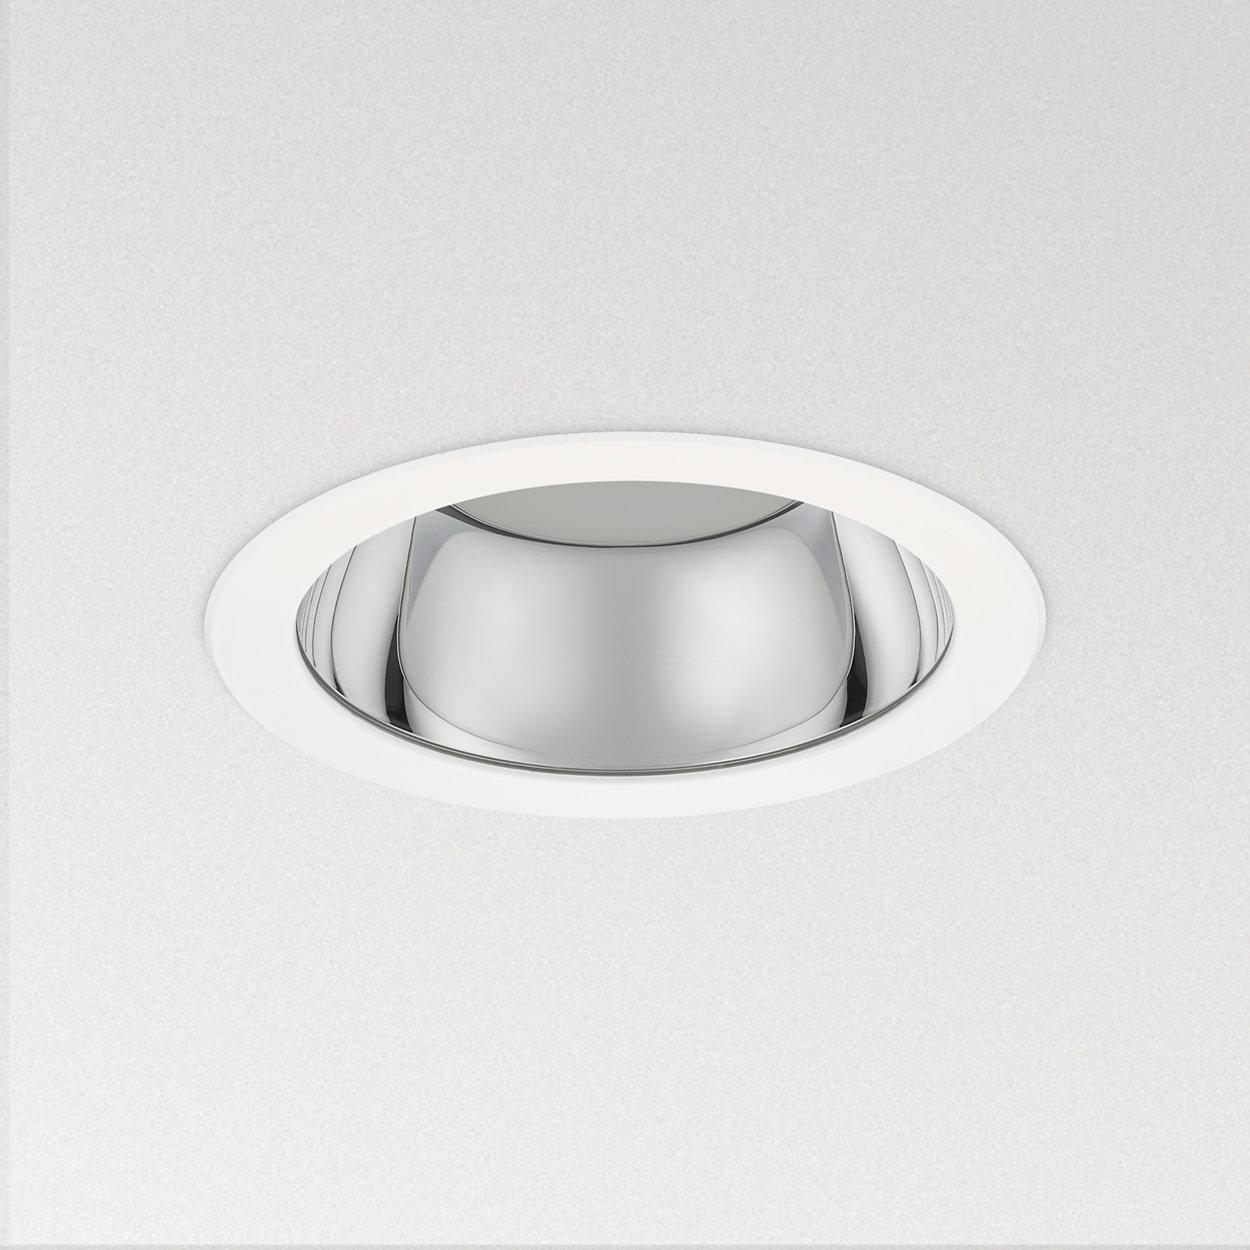 CoreLine Downlight - για κάθε εφαρμογή, όπου ο φωτισμός είναι πραγματικά σημαντικός